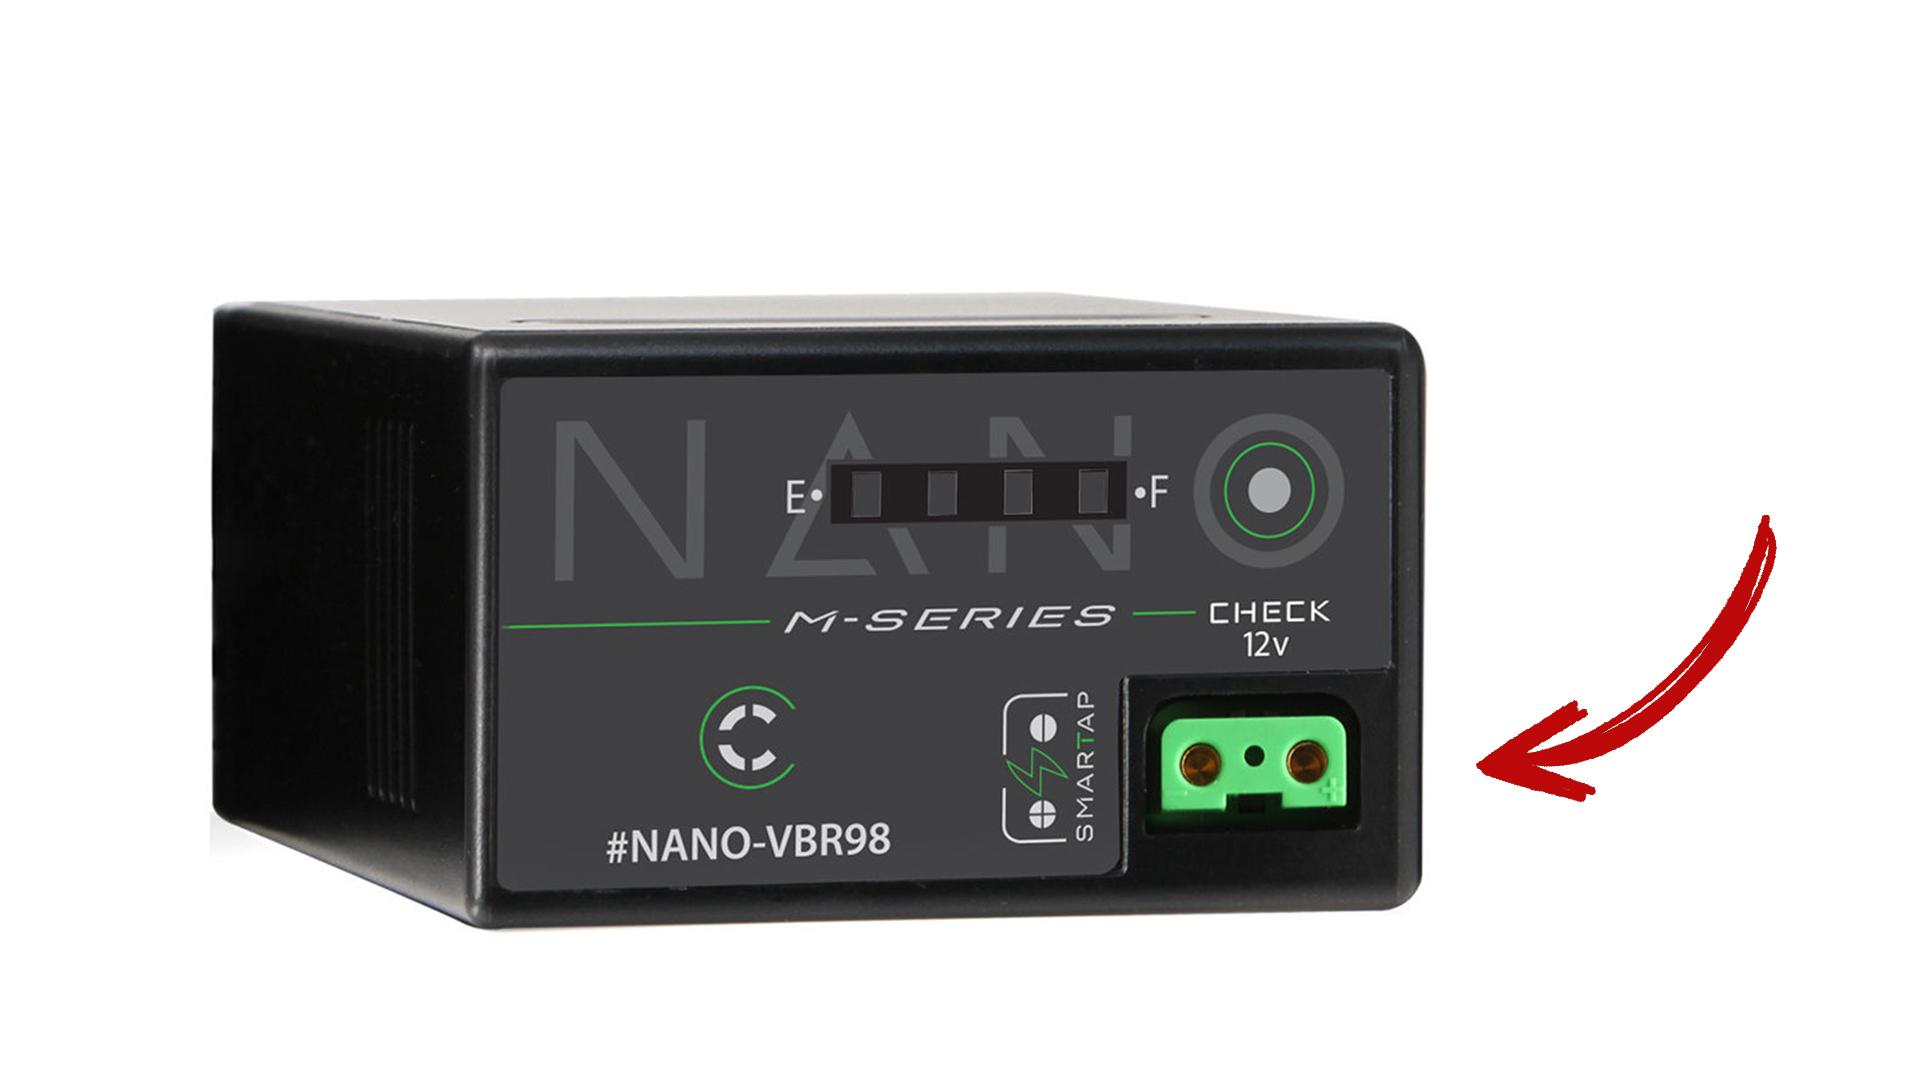 Core SWXがNano-VBR98 D-Tap付き互換バッテリーを発売 - パナソニック EVA1に対応